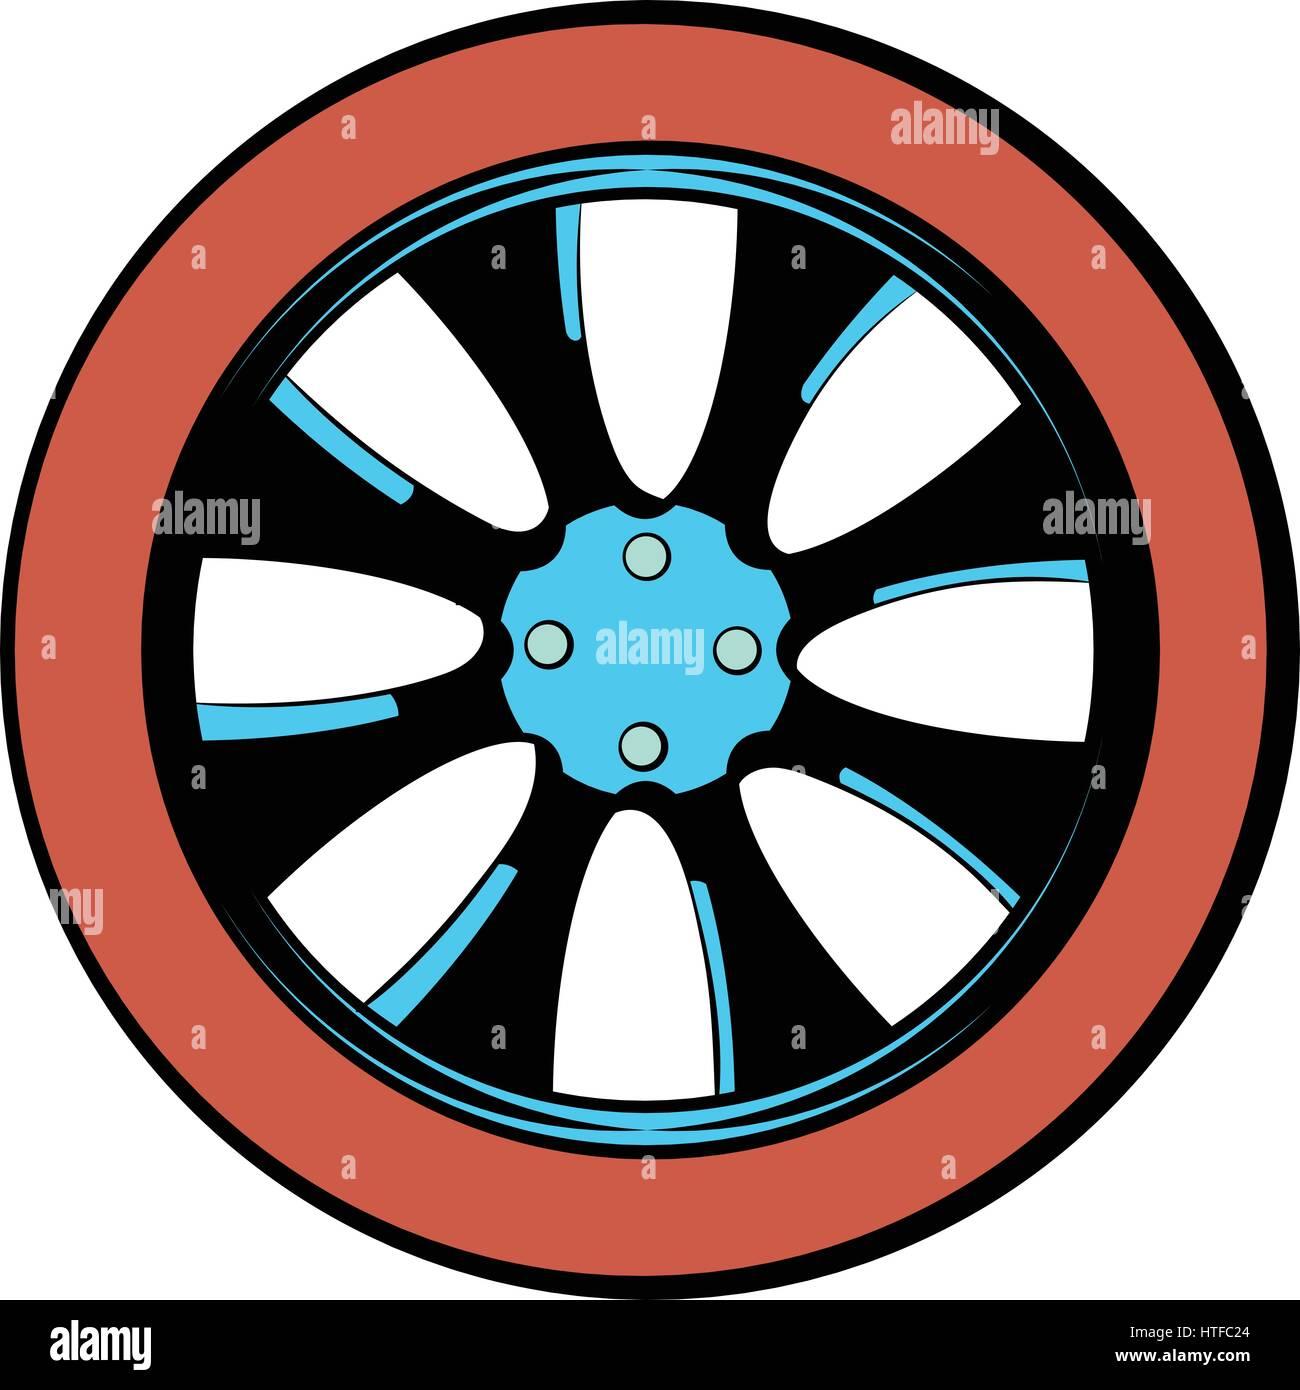 Rotor icon cartoon - Stock Image